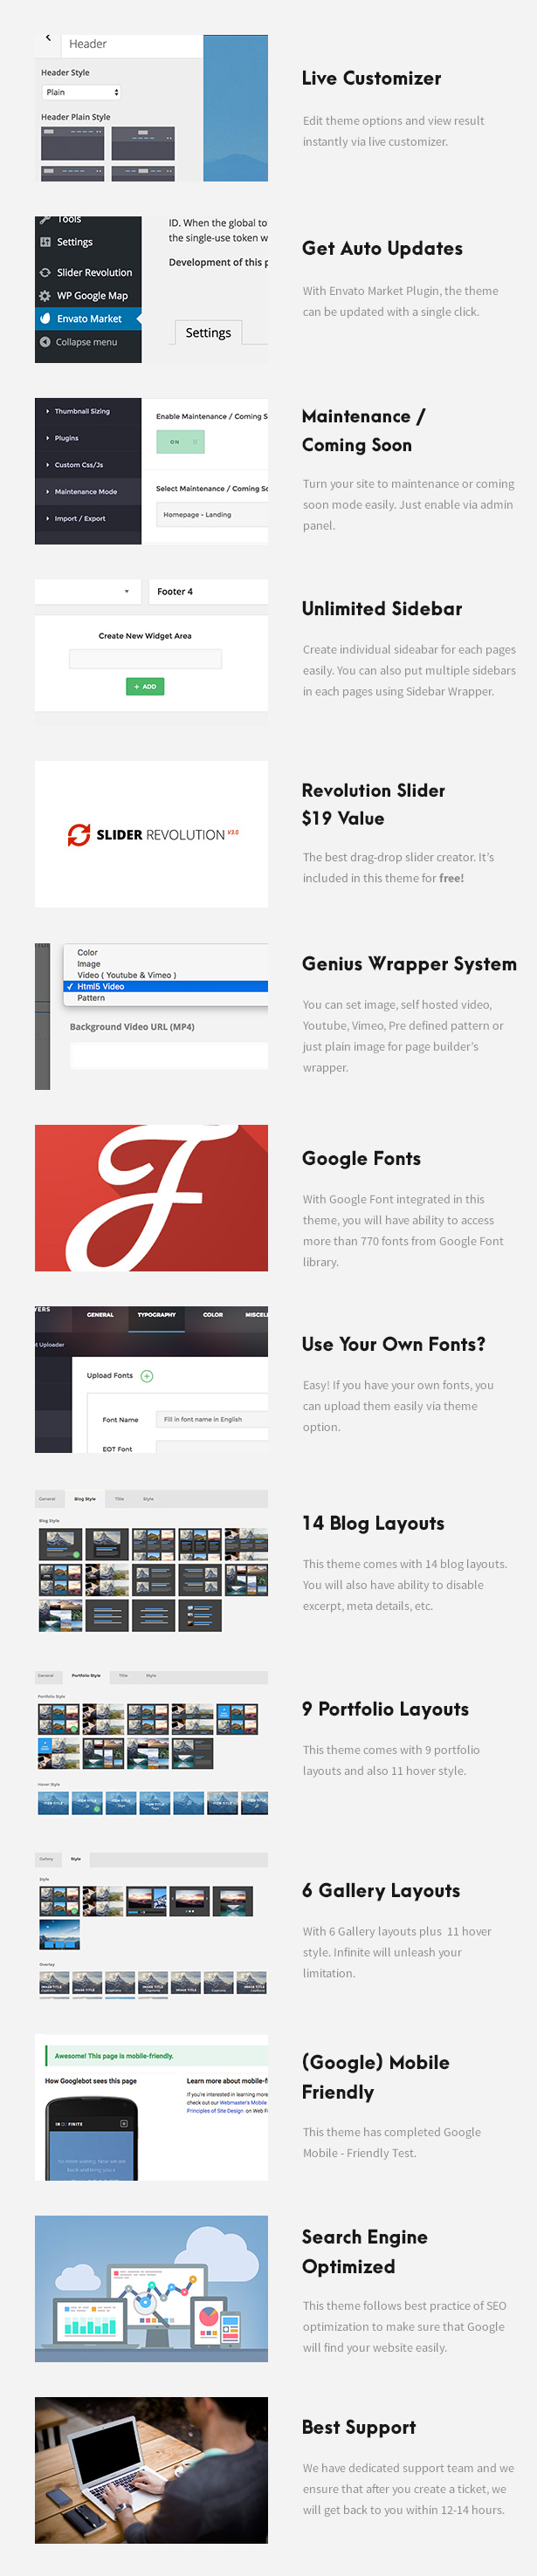 Kleanity - سمة WordPress بسيطة / محفظة إبداعية - 10